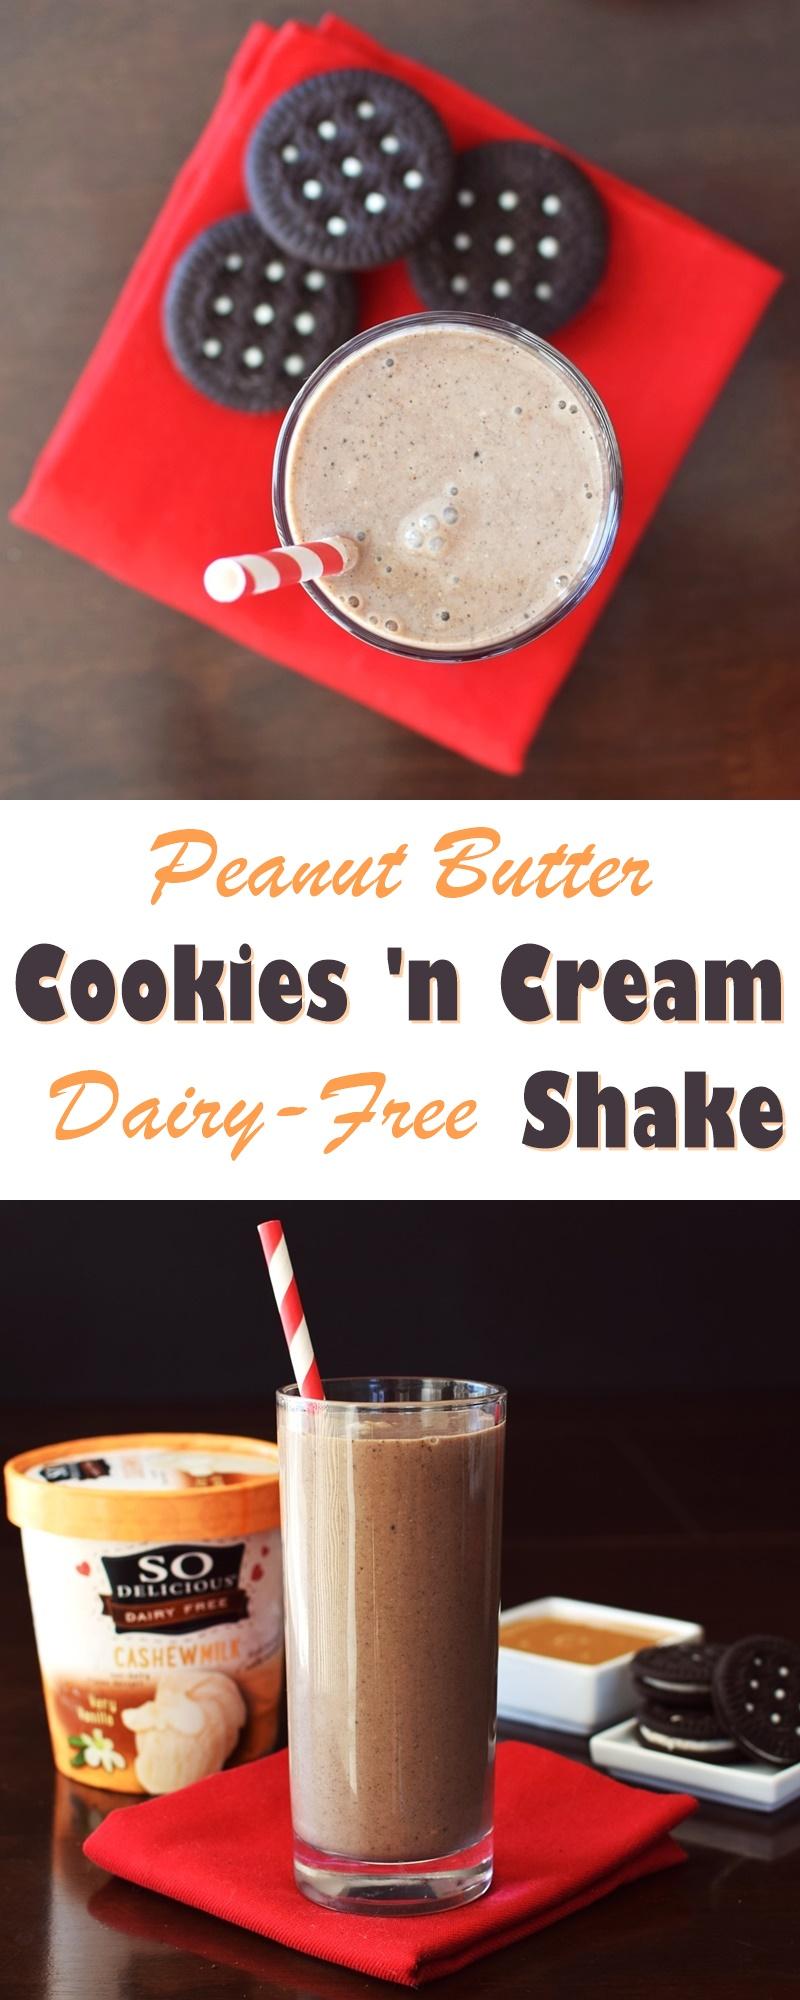 Peanut Butter Cookies 'n Cream Shake Recipe (indulgent vegan milkshakes with peanut butter, gluten-free sandwich cookies and very vanilla dairy-free ice cream)